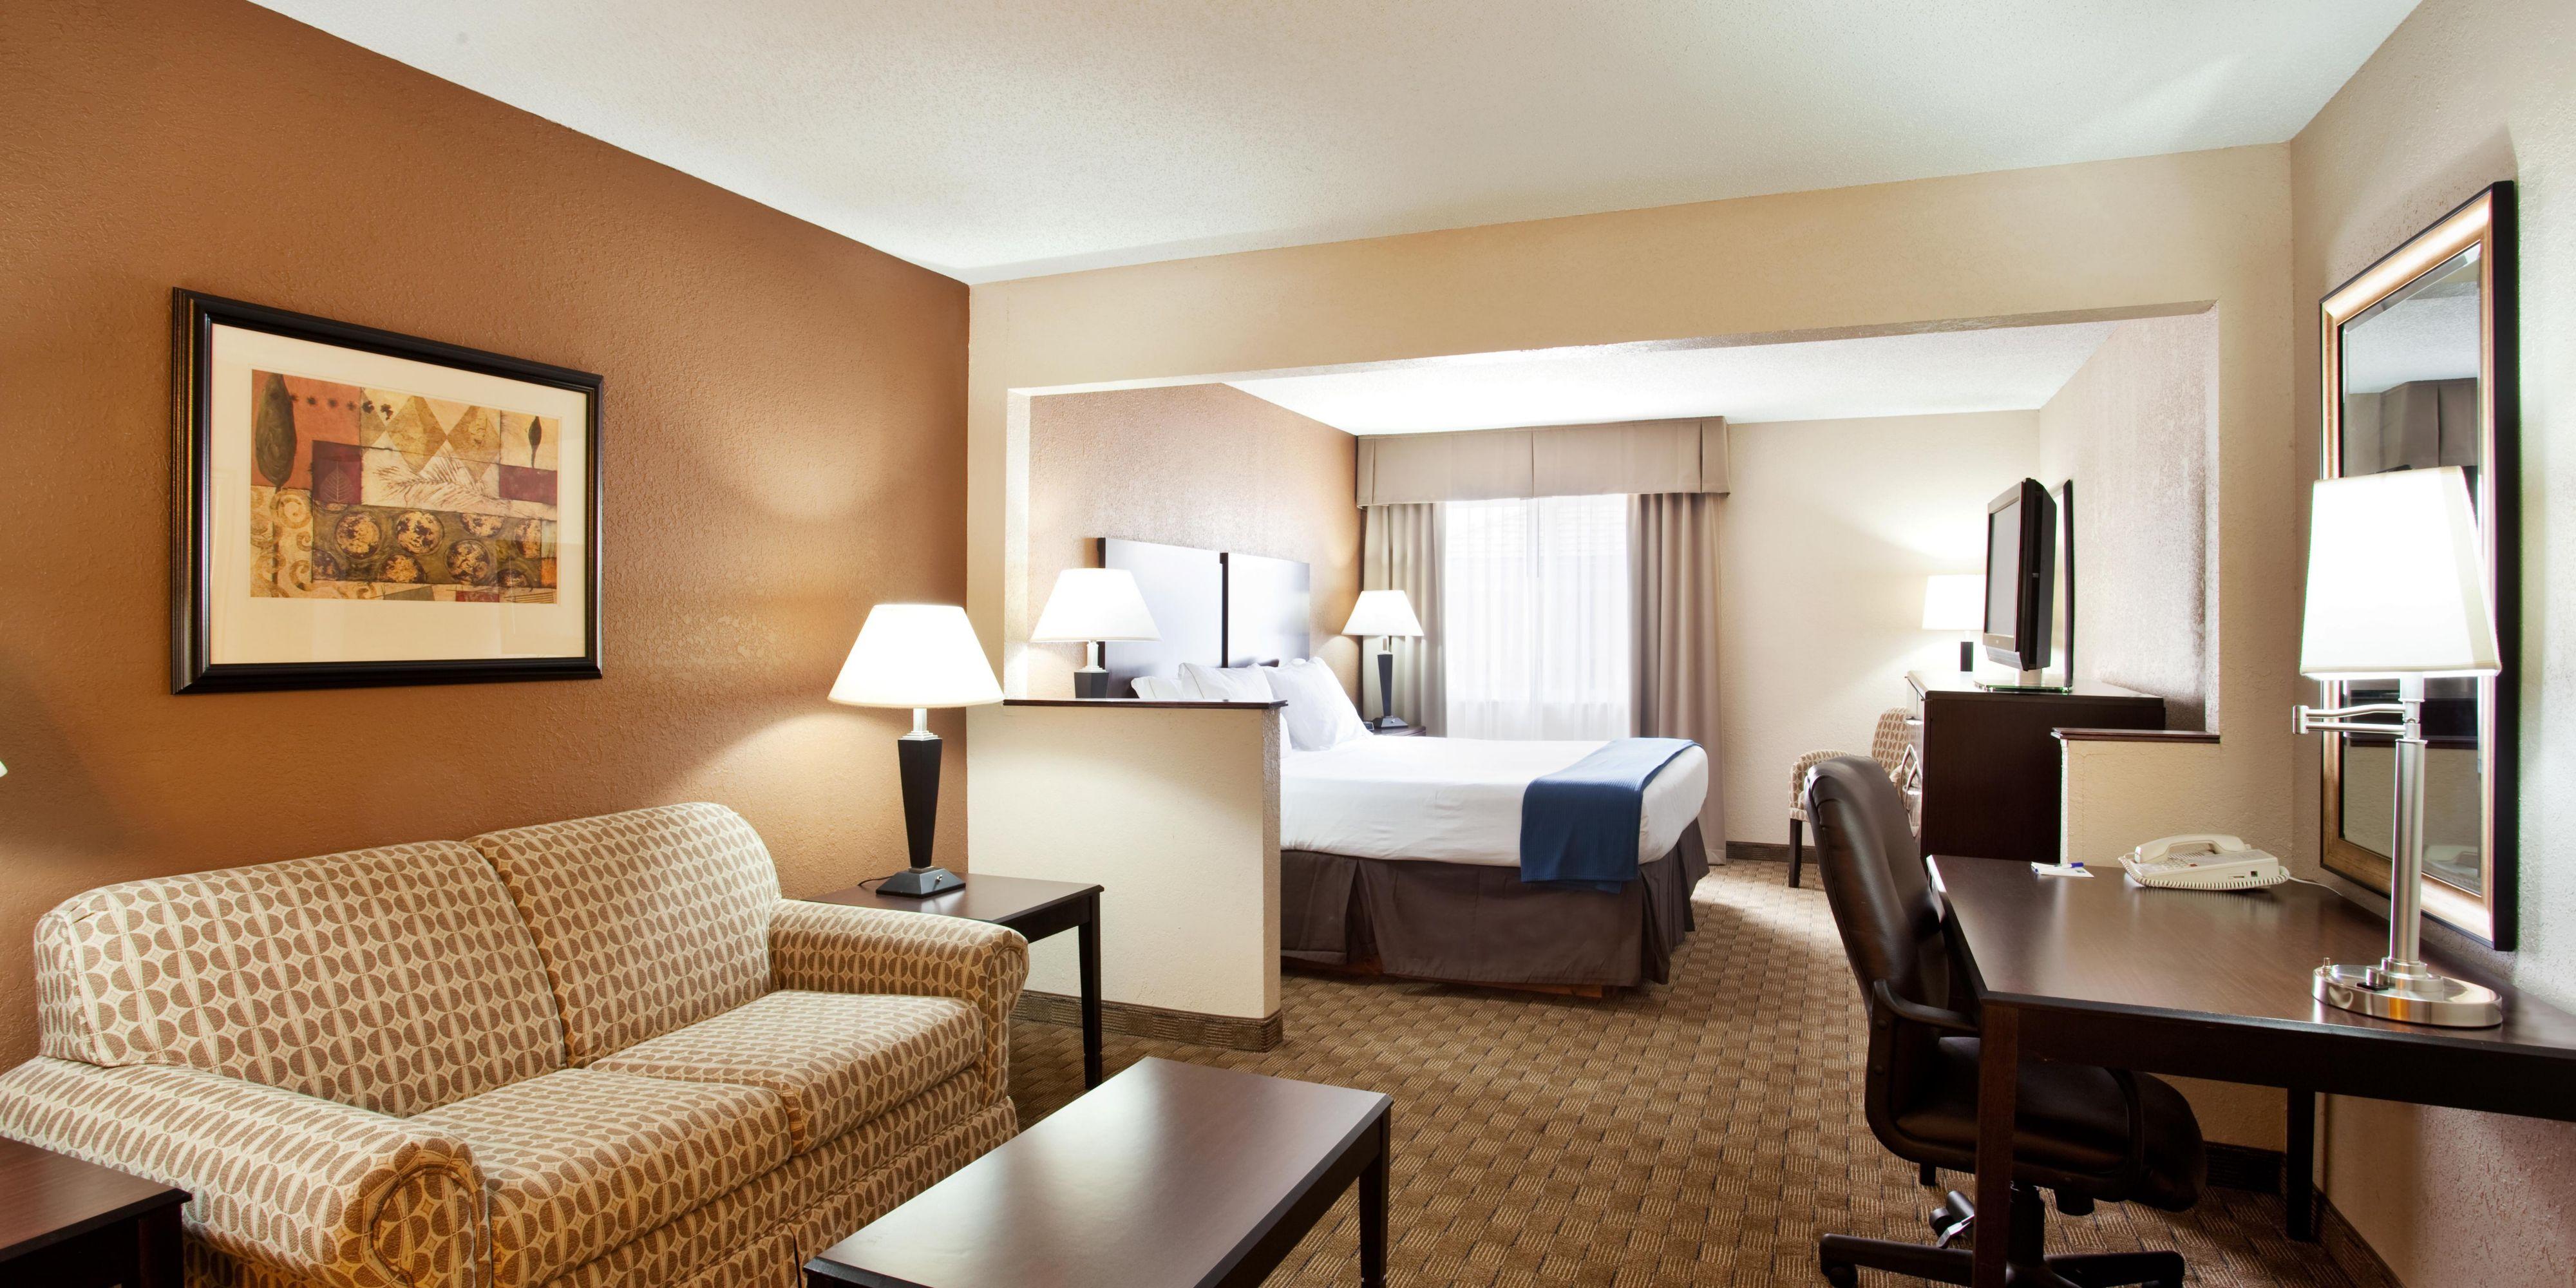 Holiday Inn Express Tuscola 2533433438 2x1